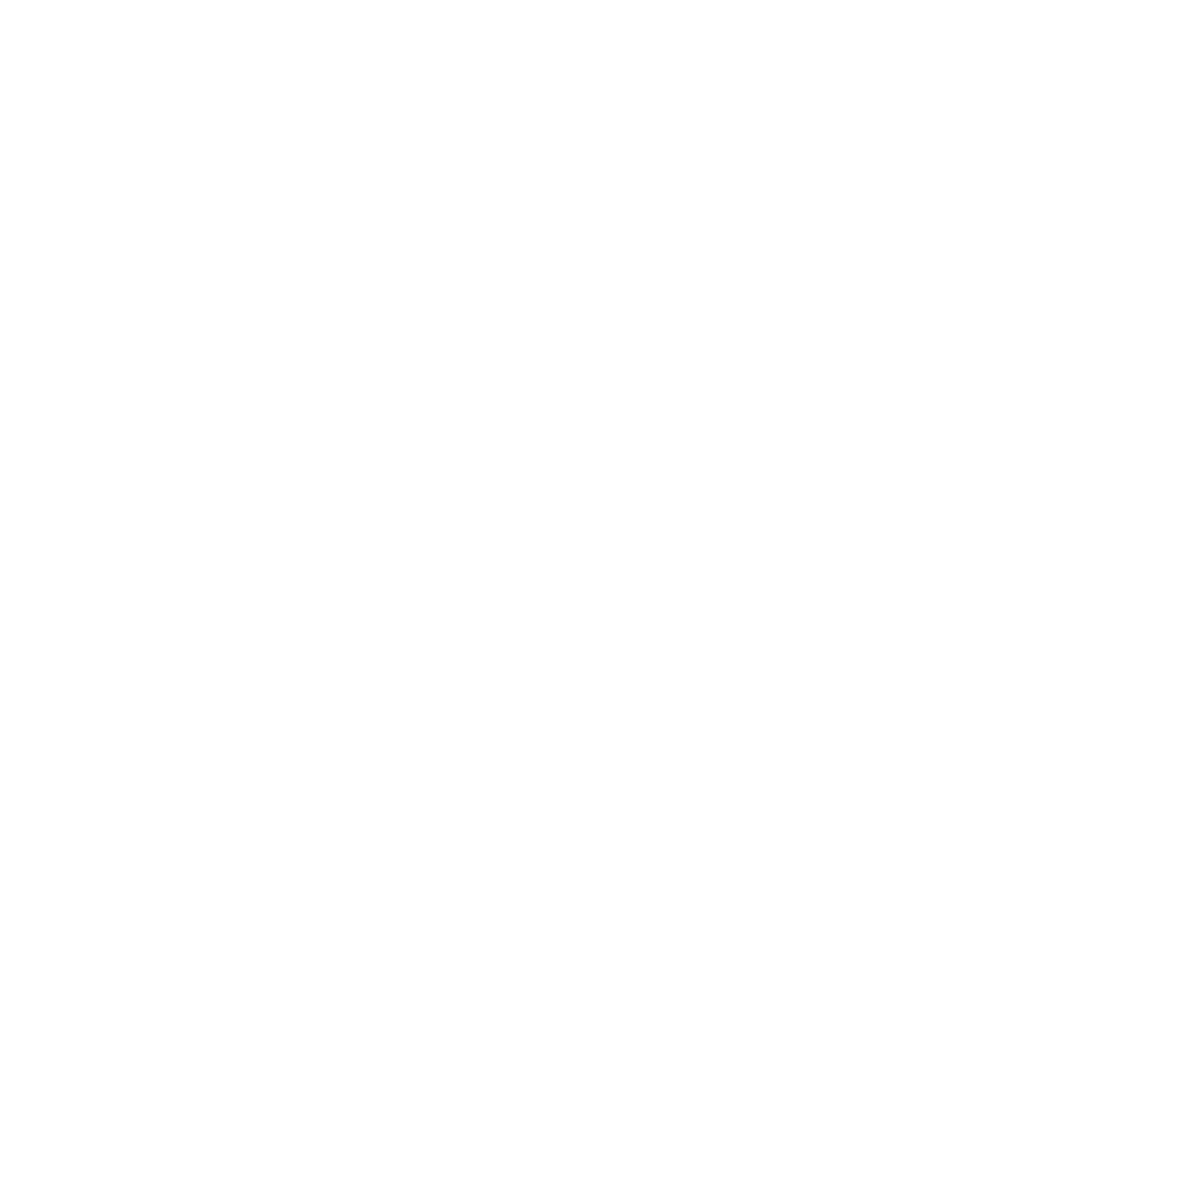 BB Kommunikation